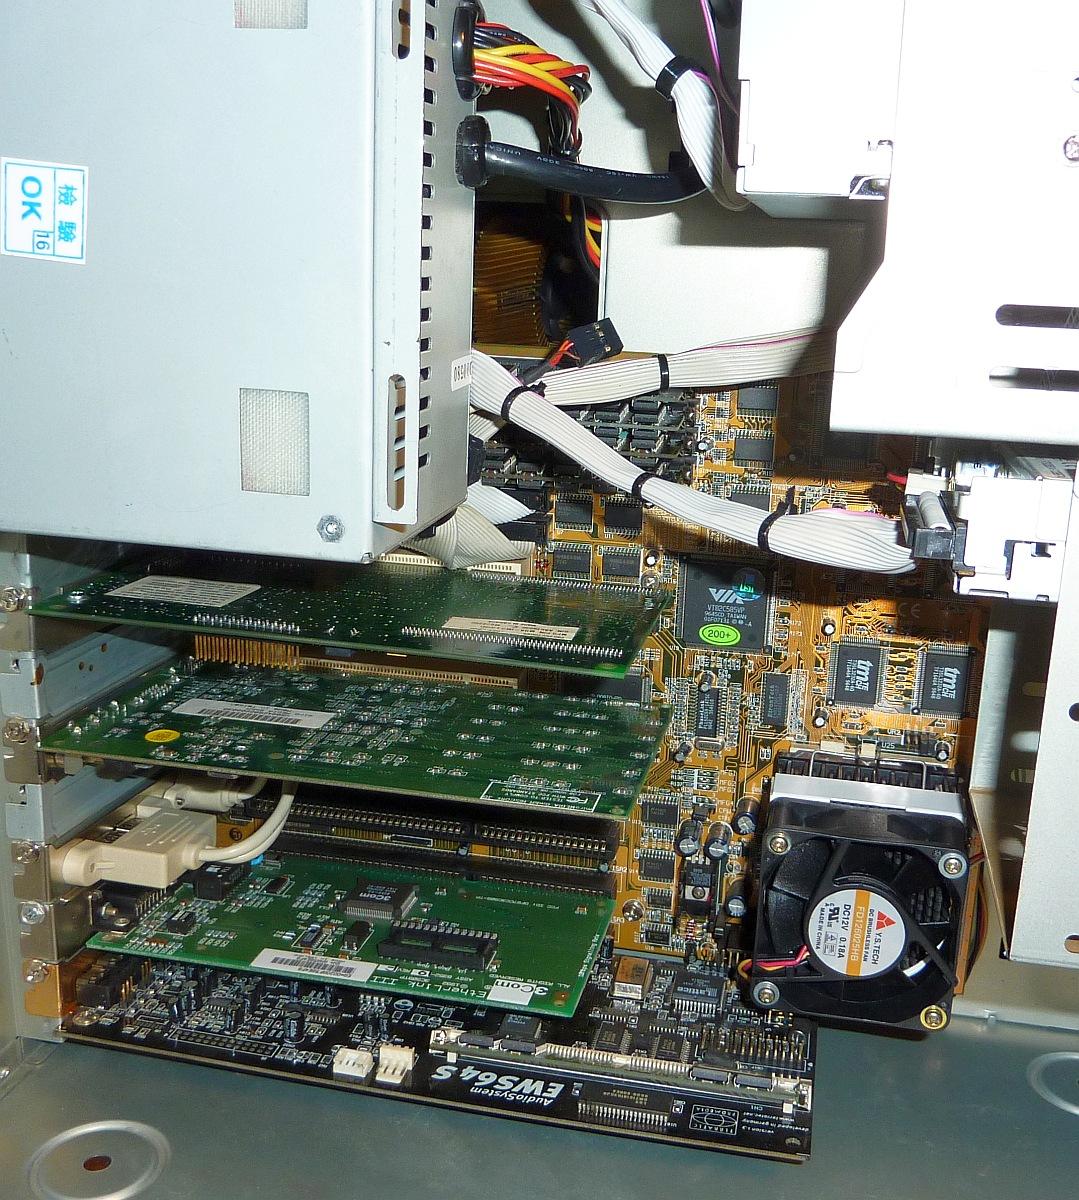 S7 FIC PA-2005 PCI 1200.jpg